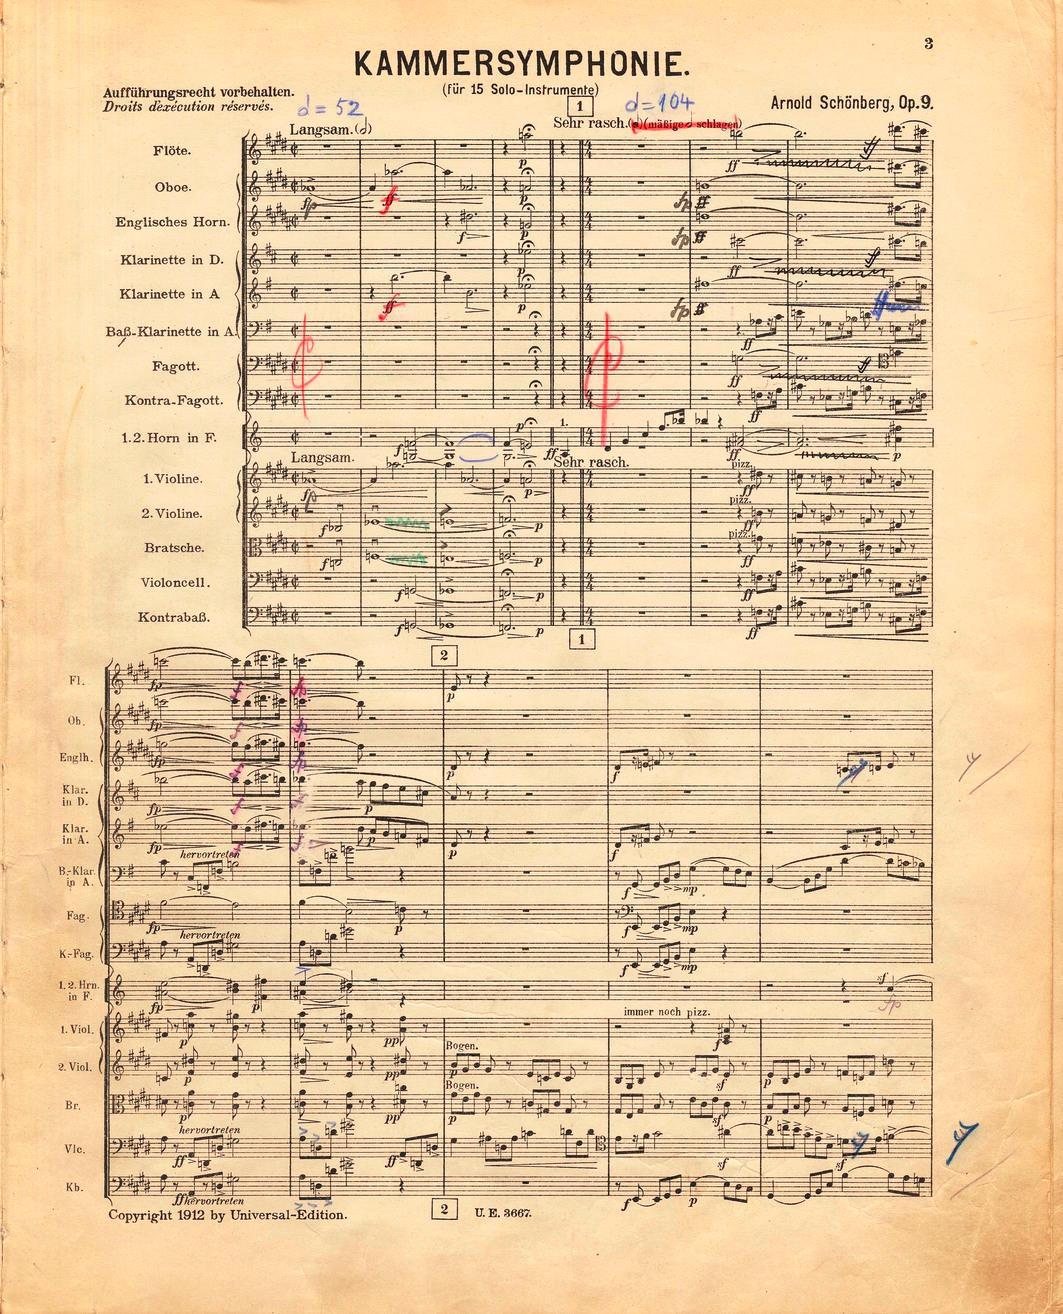 Schönbergs Handexemplar der Partitur